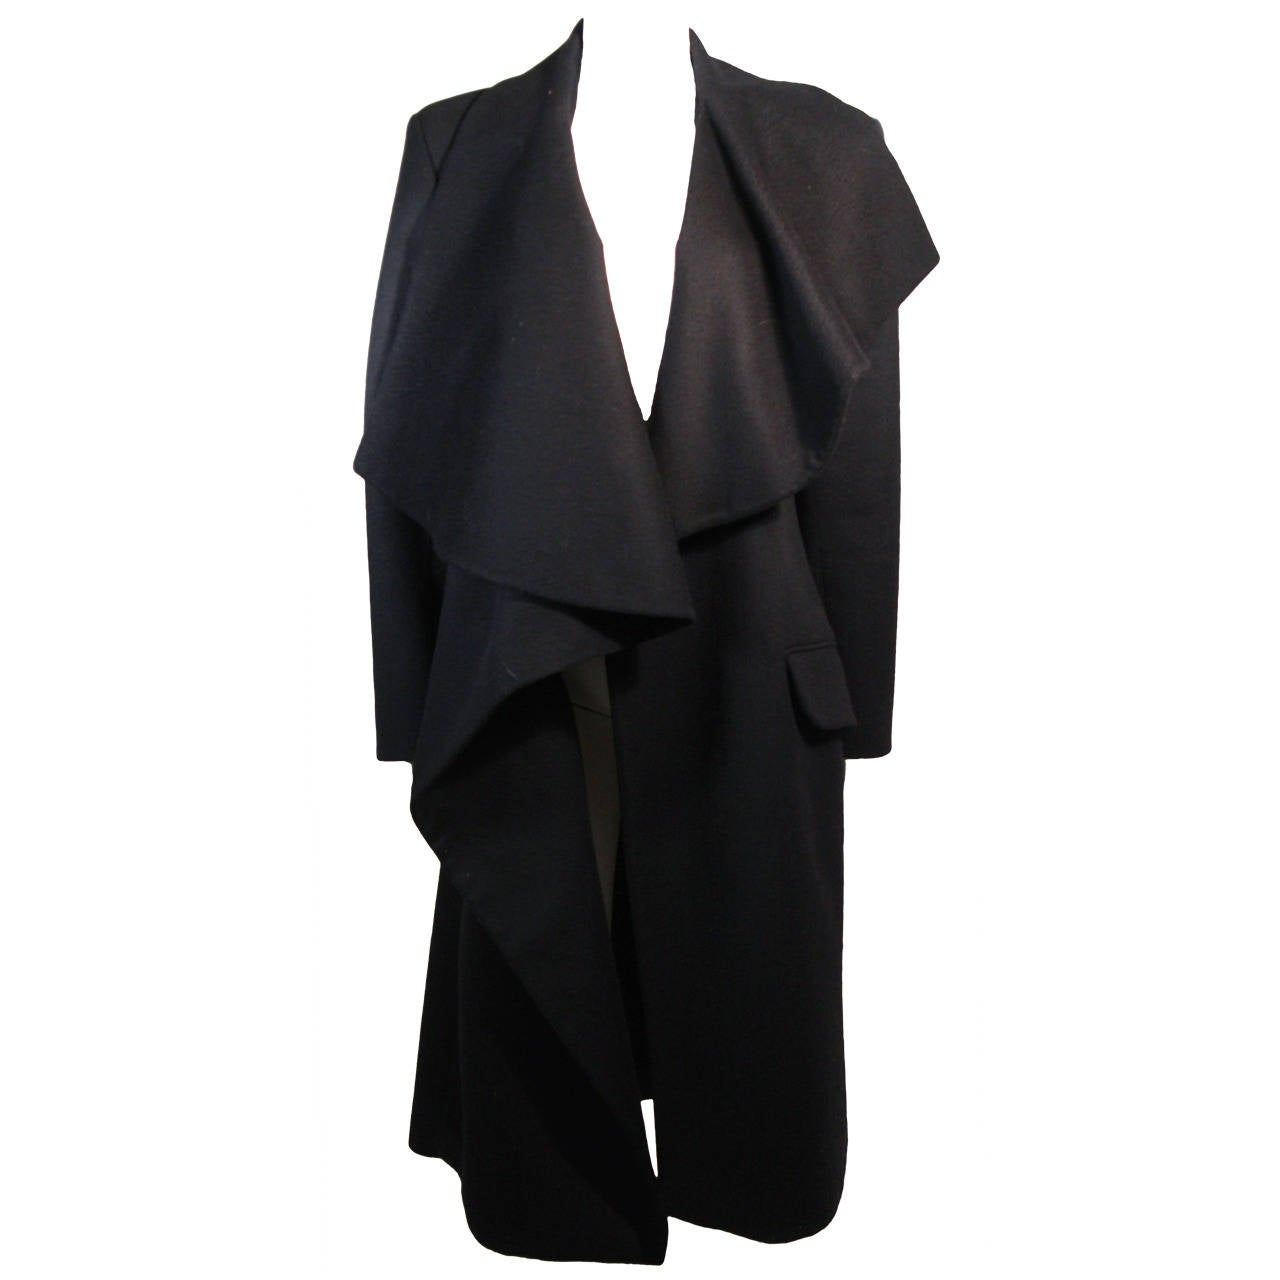 John Galliano Over-Sized Asymmetrical Collar Coat Size 10 42 For Sale